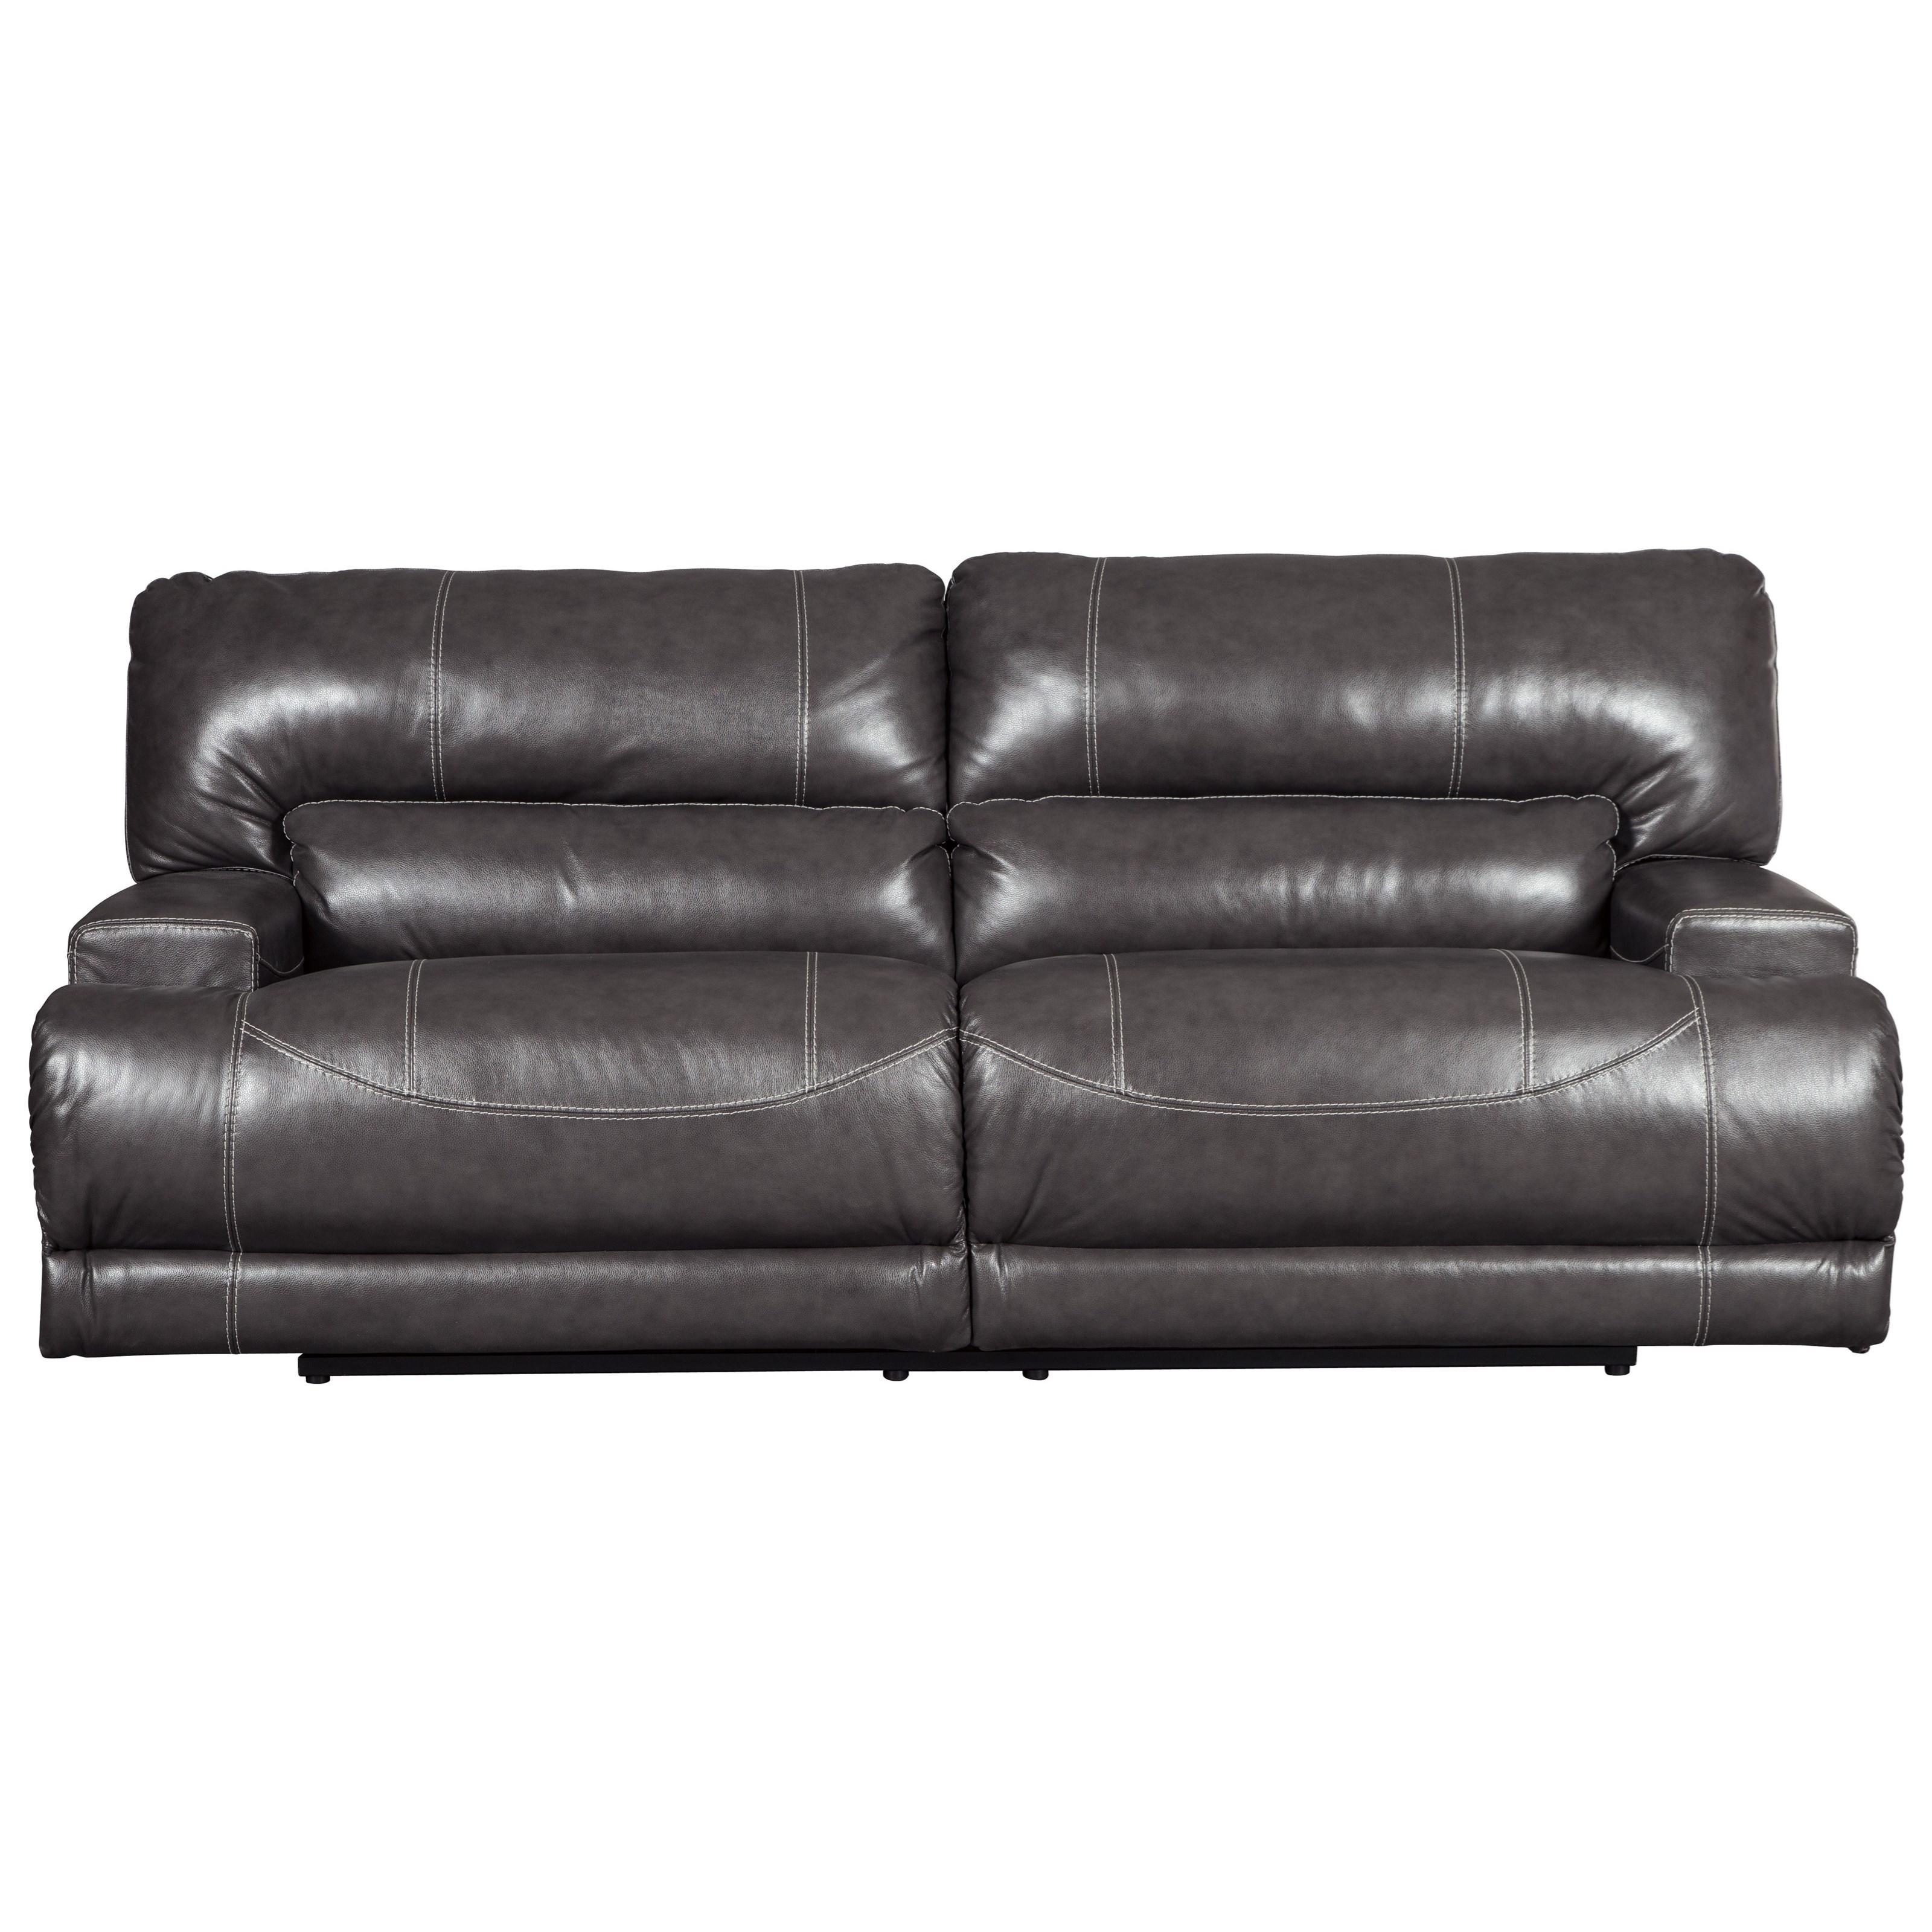 McCaskill 2-Seat Reclining Power Sofa by Ashley (Signature Design) at Johnny Janosik